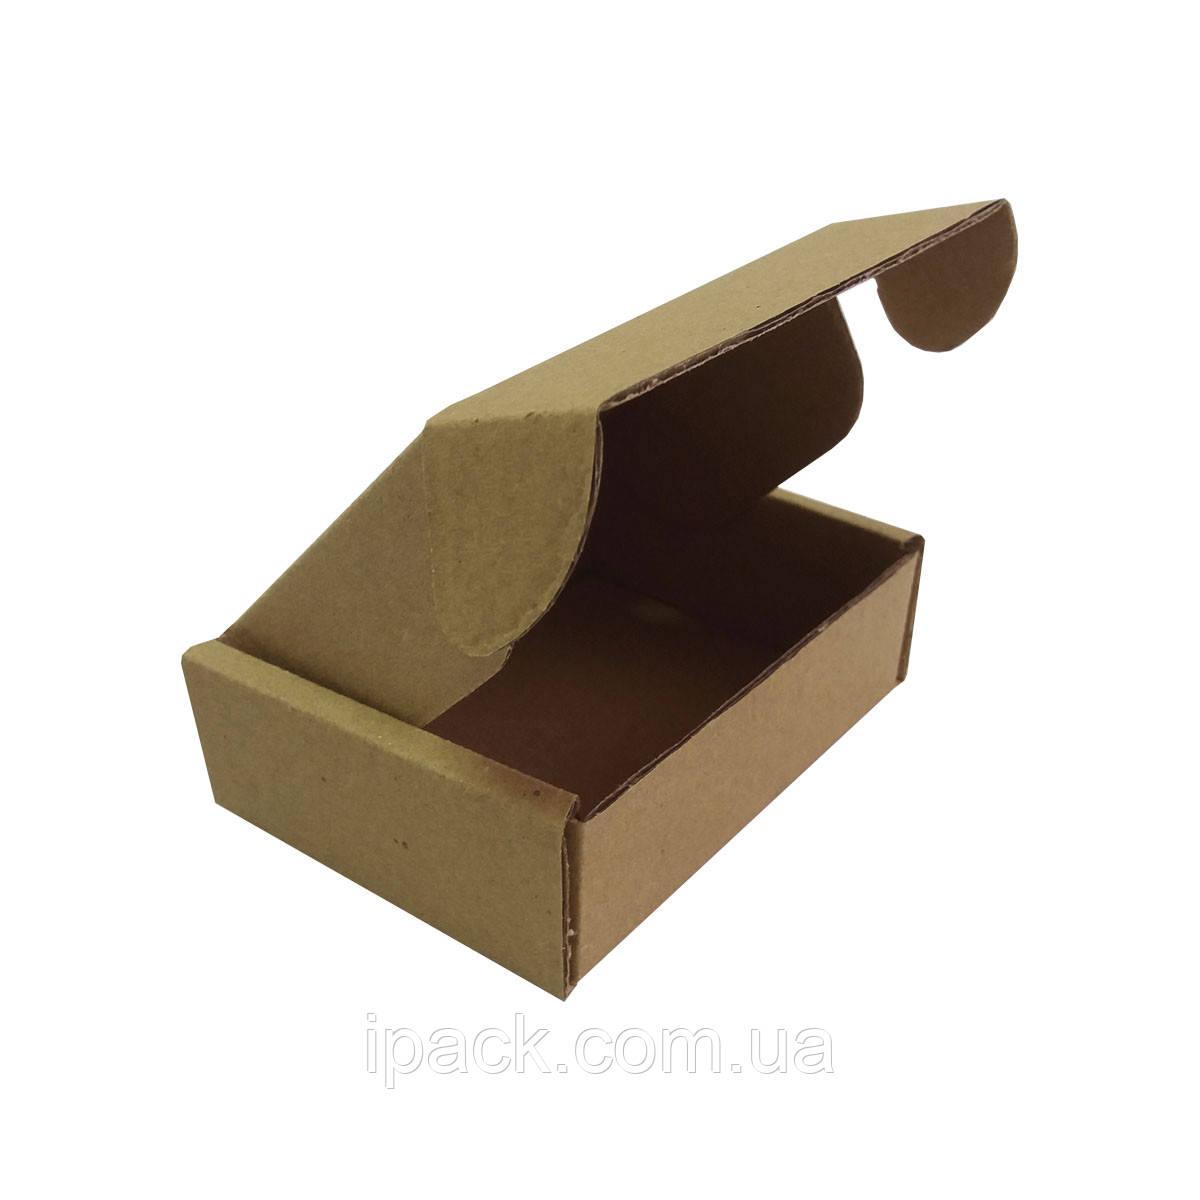 Коробка картонная самосборная 85*48*35 мм бурая крафт микрогофрокартон